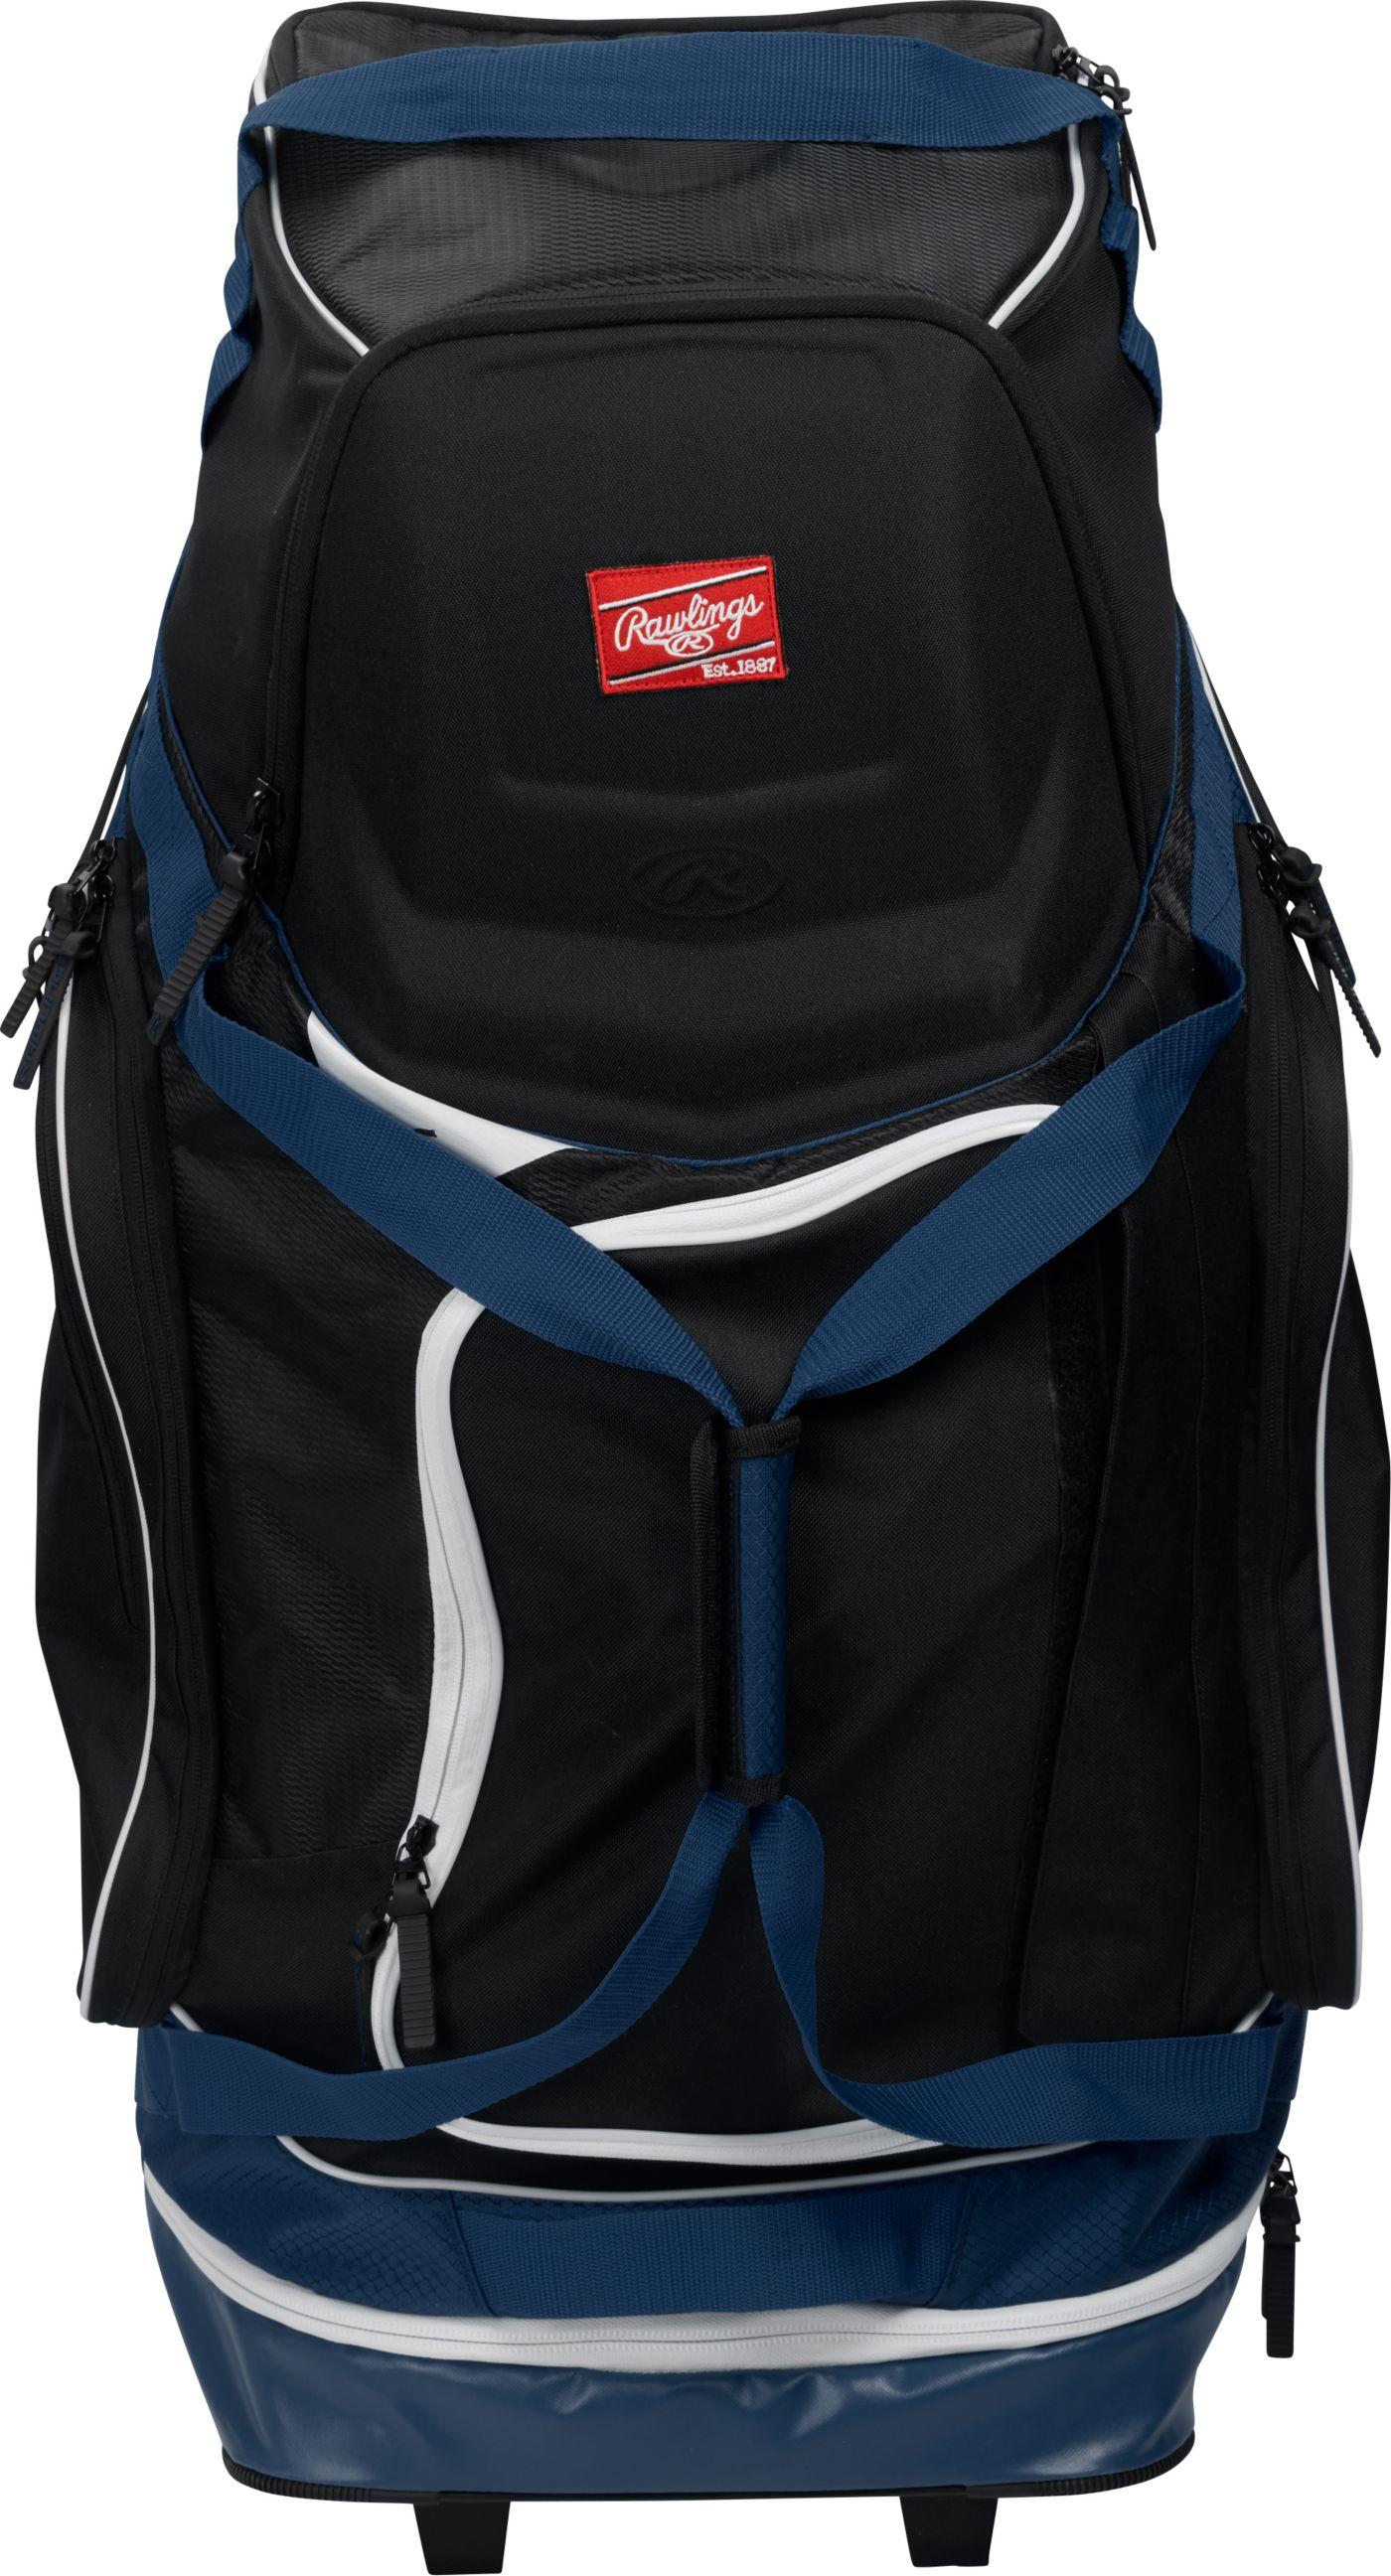 Rawlings R1502 Wheeled Catcher's Gear Bag